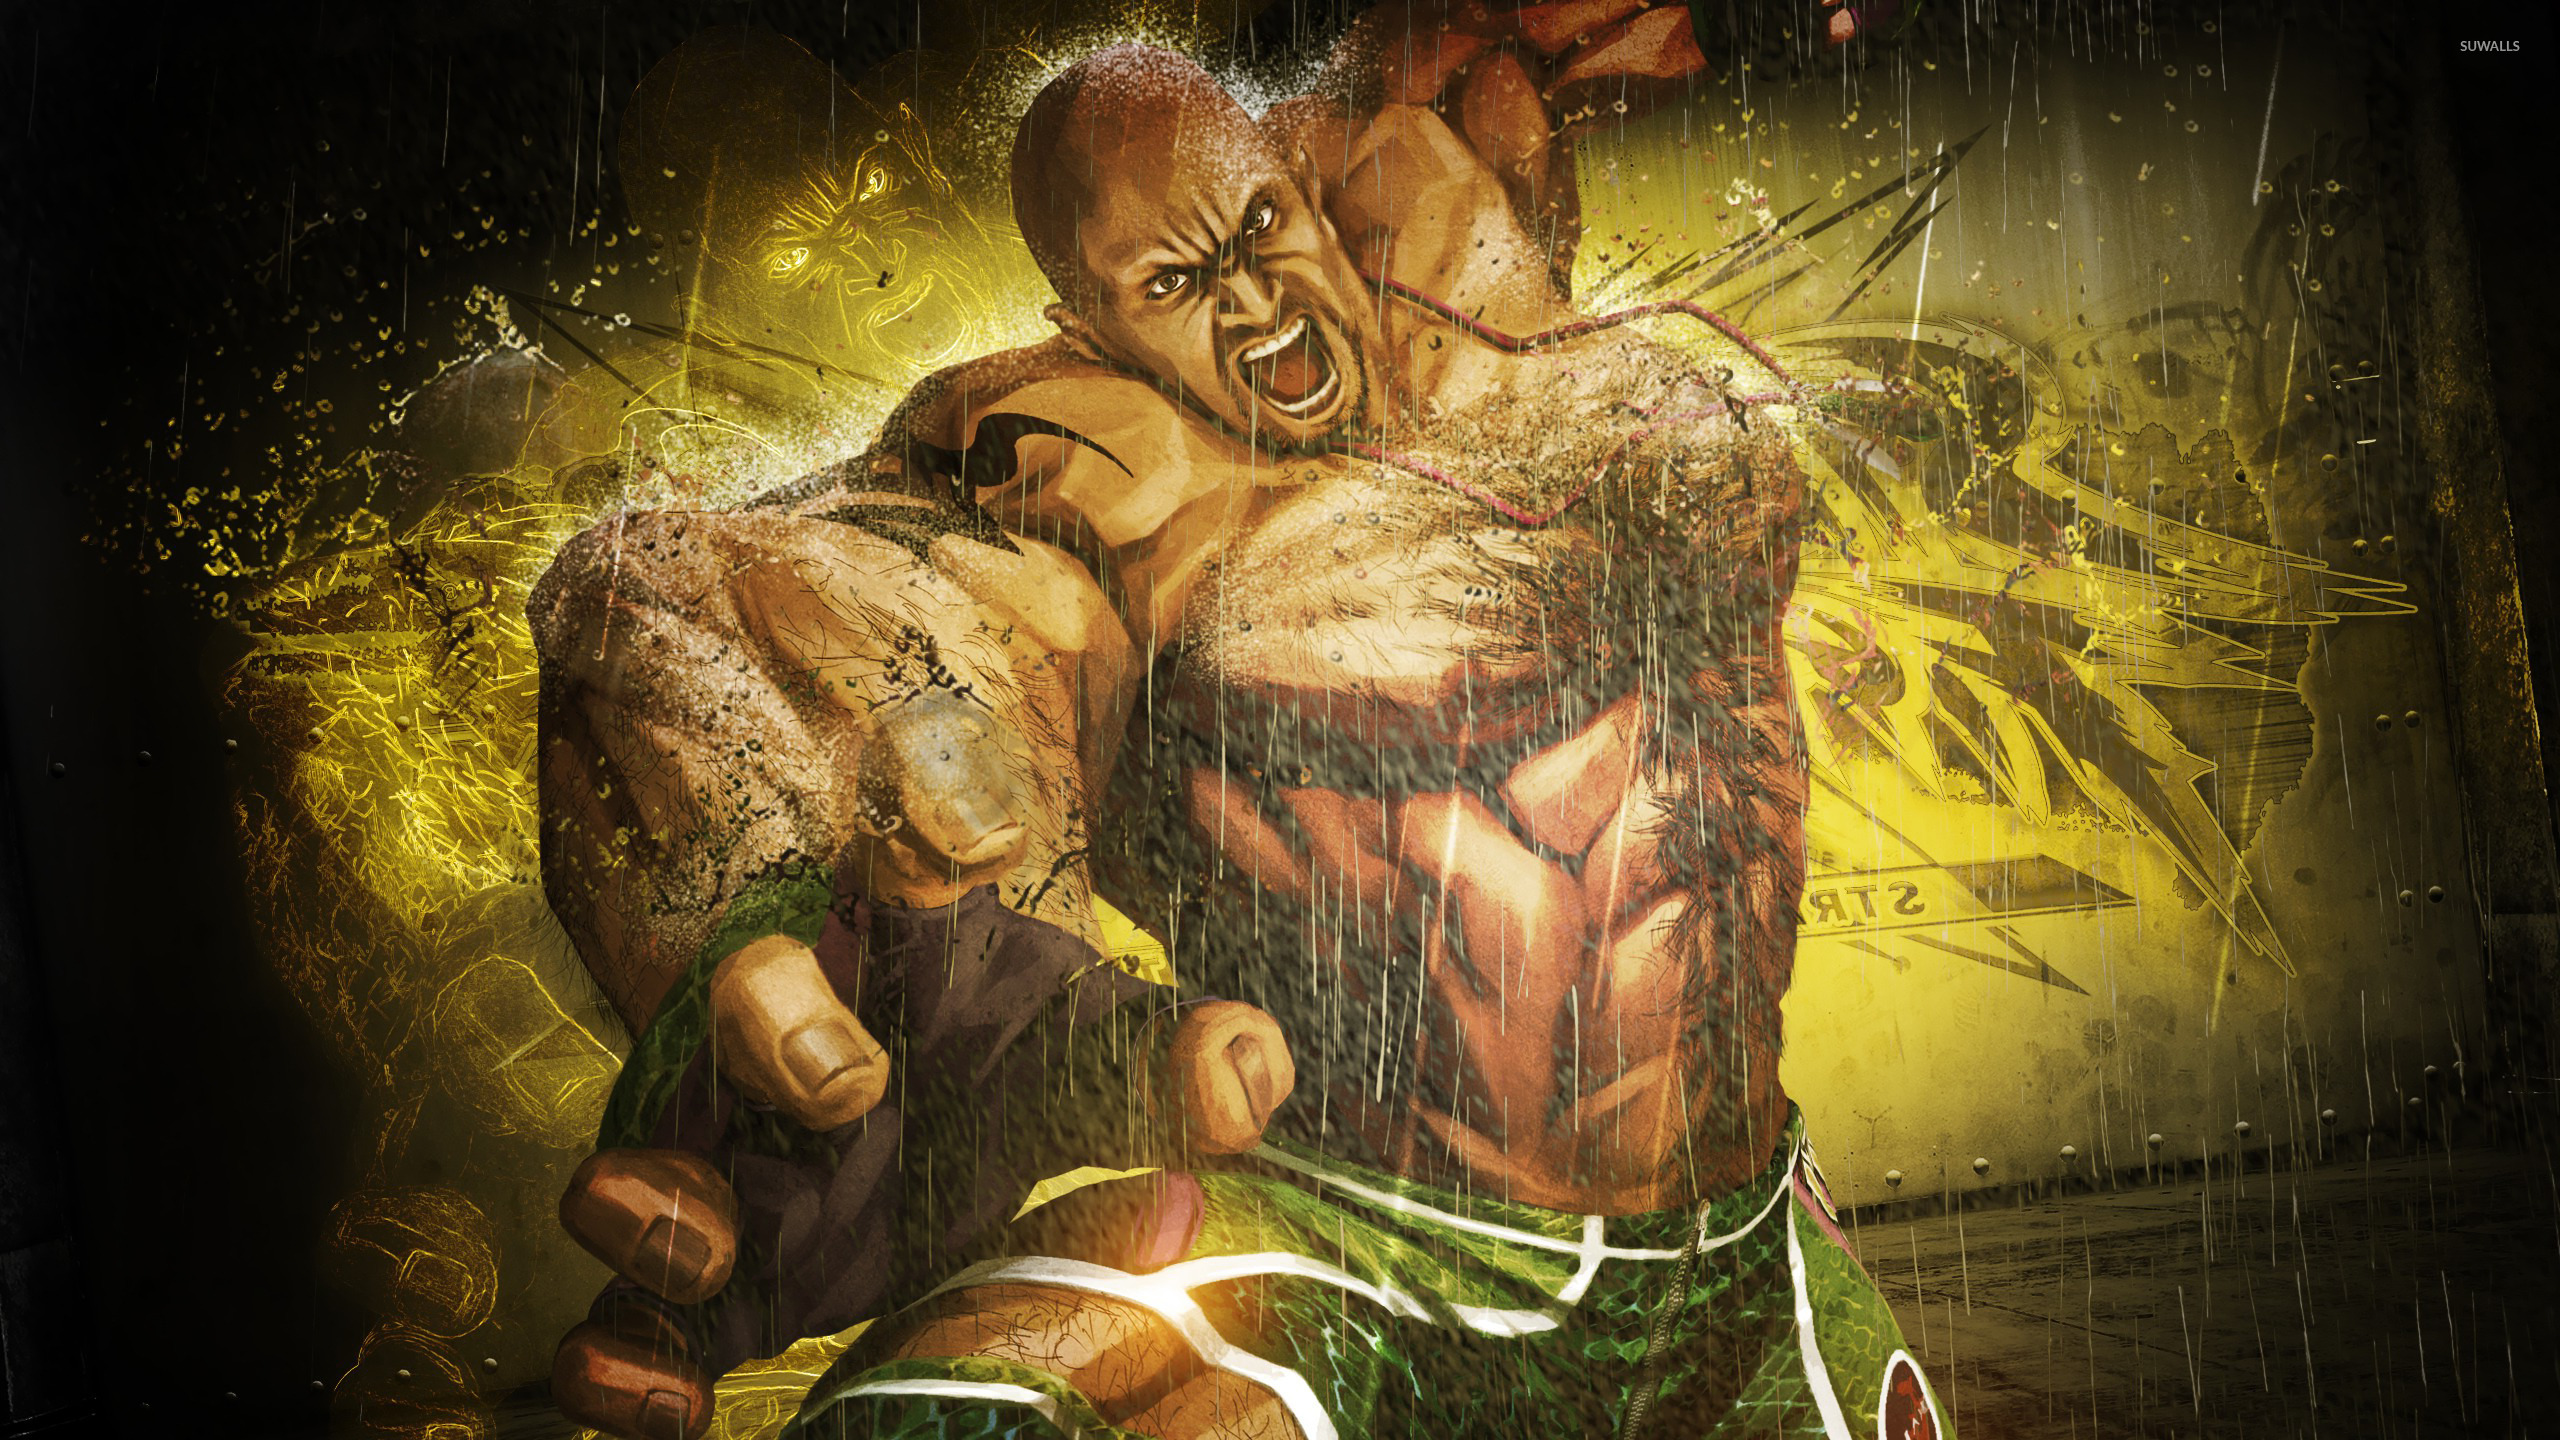 Marduk Street Fighter X Tekken Wallpaper Game Wallpapers 18342